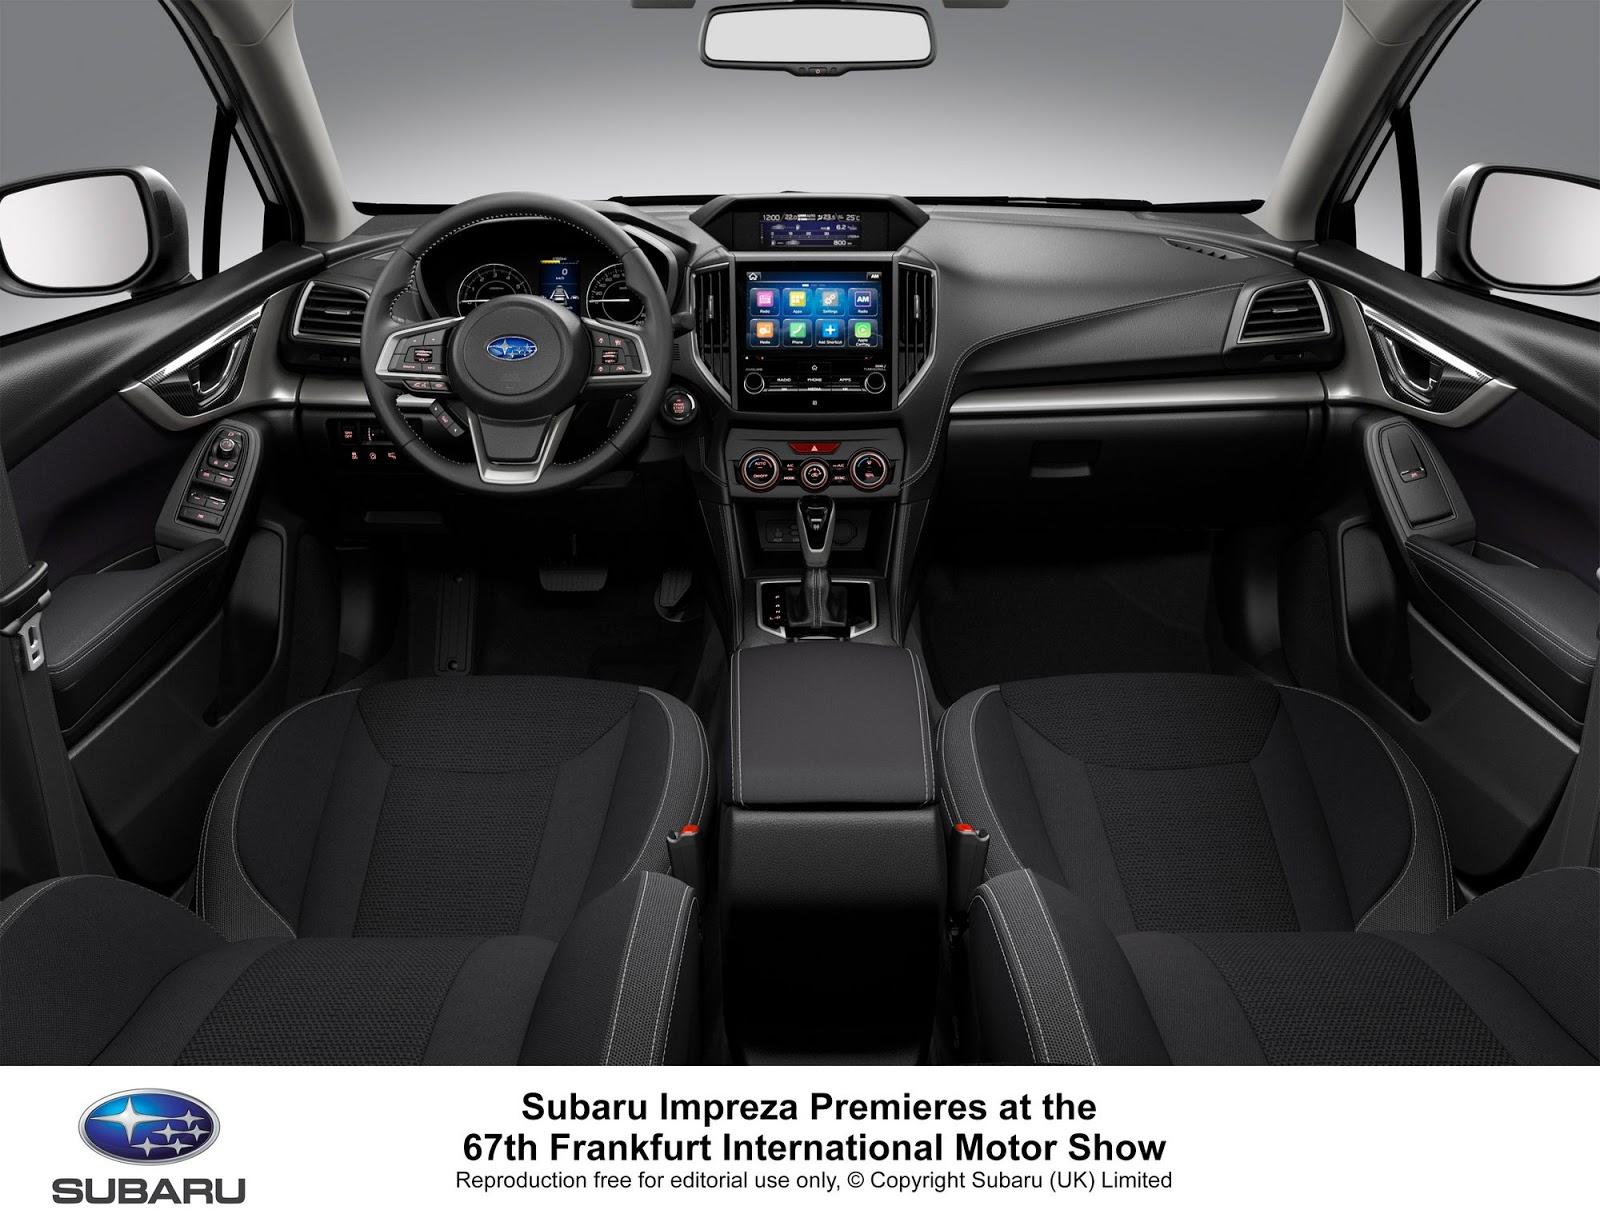 2018-Subaru-Impreza-15